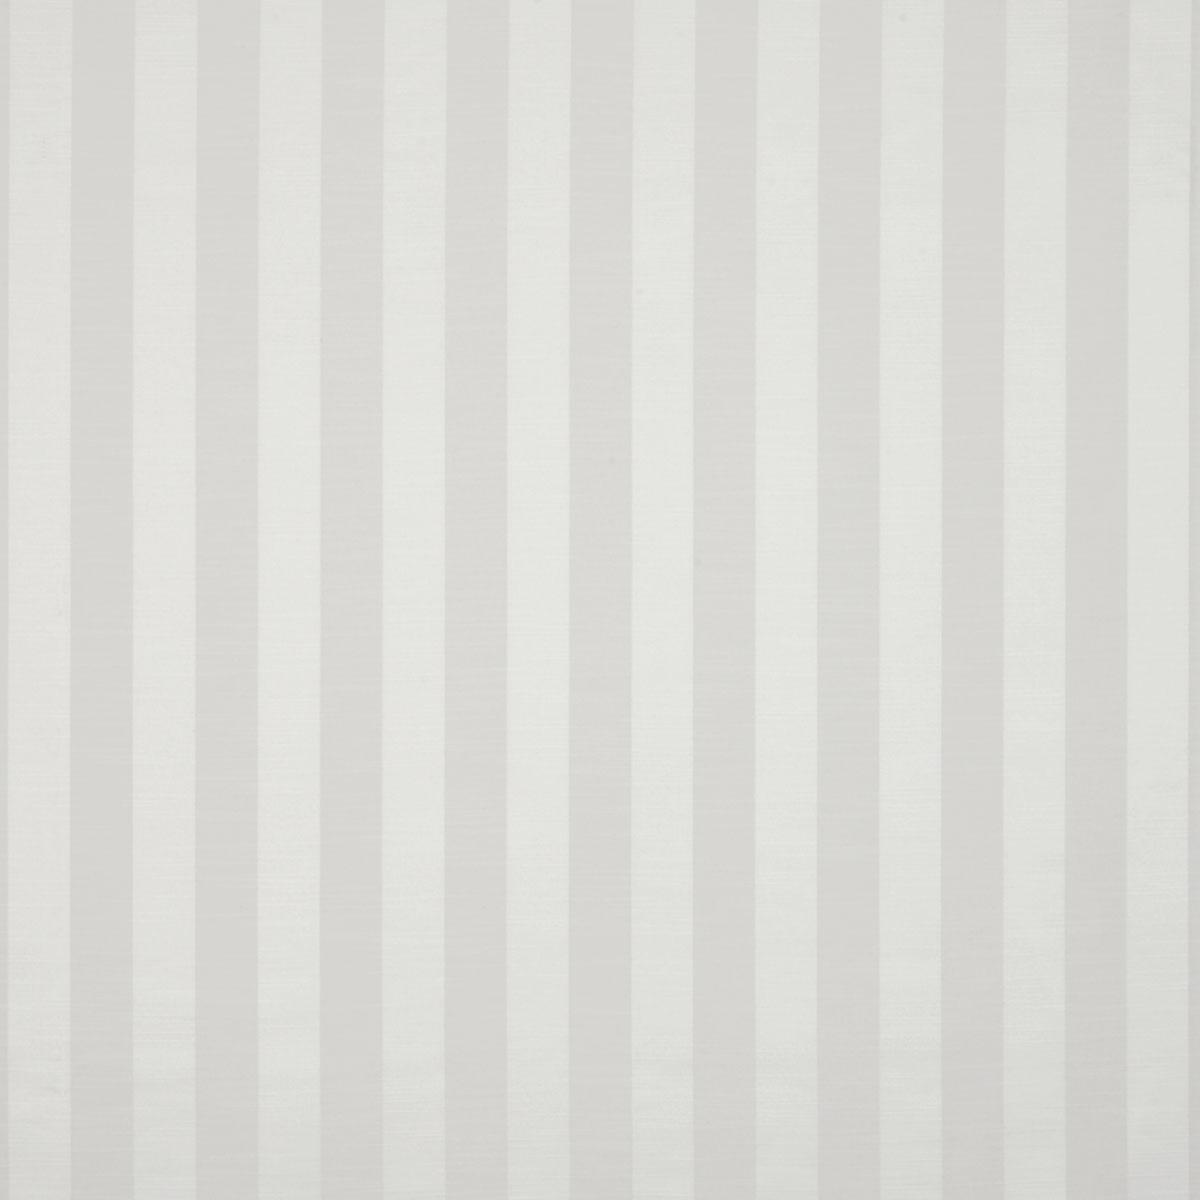 Black And White Curtain Fabric - Curtain Ideas